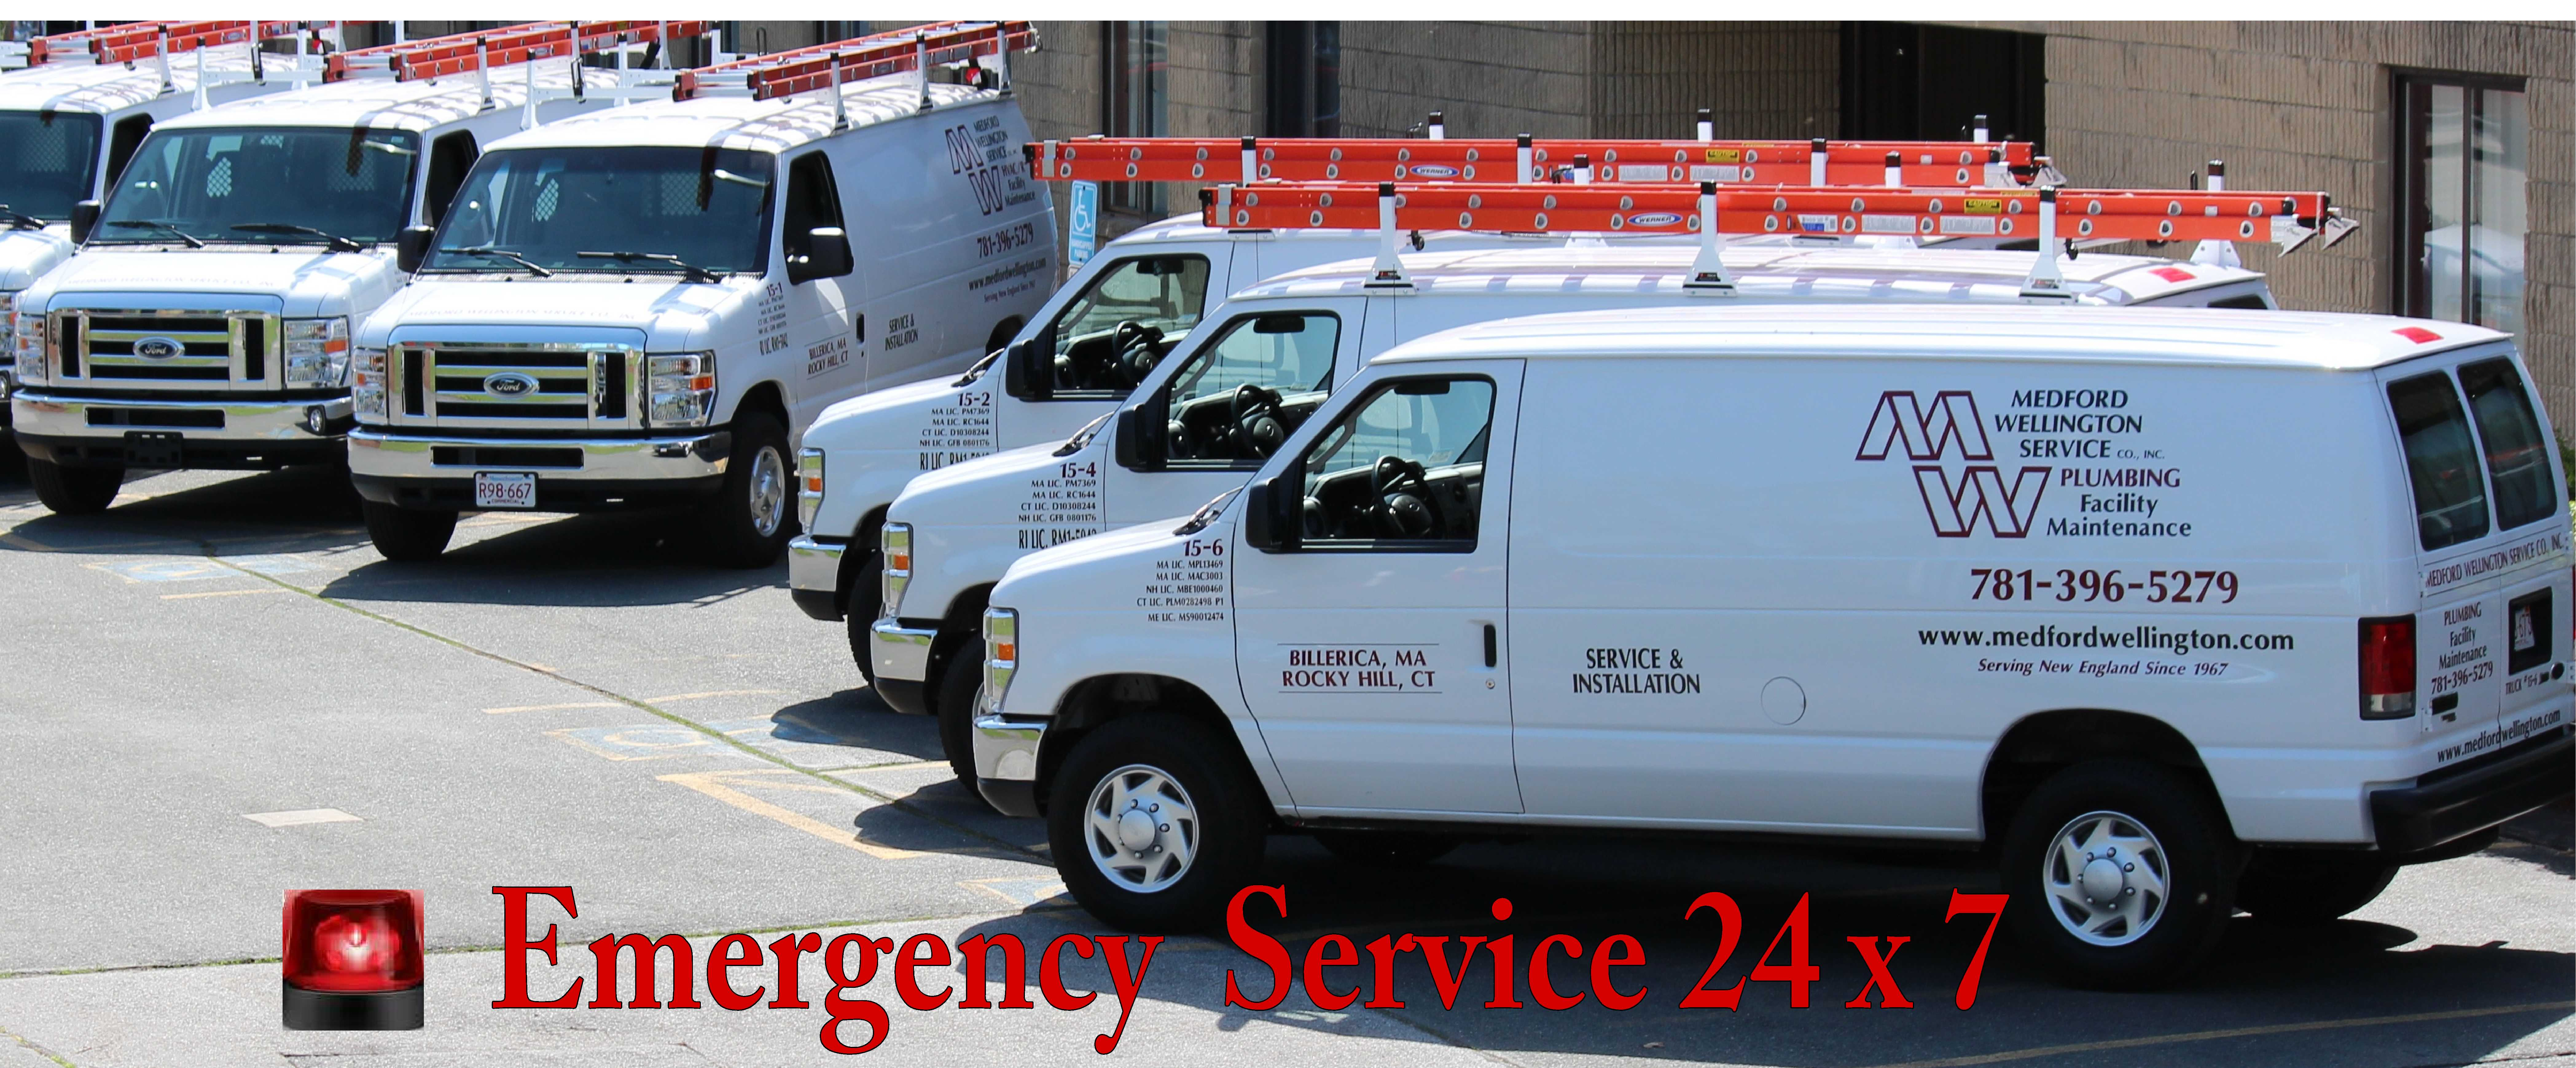 trucksemergencyservice